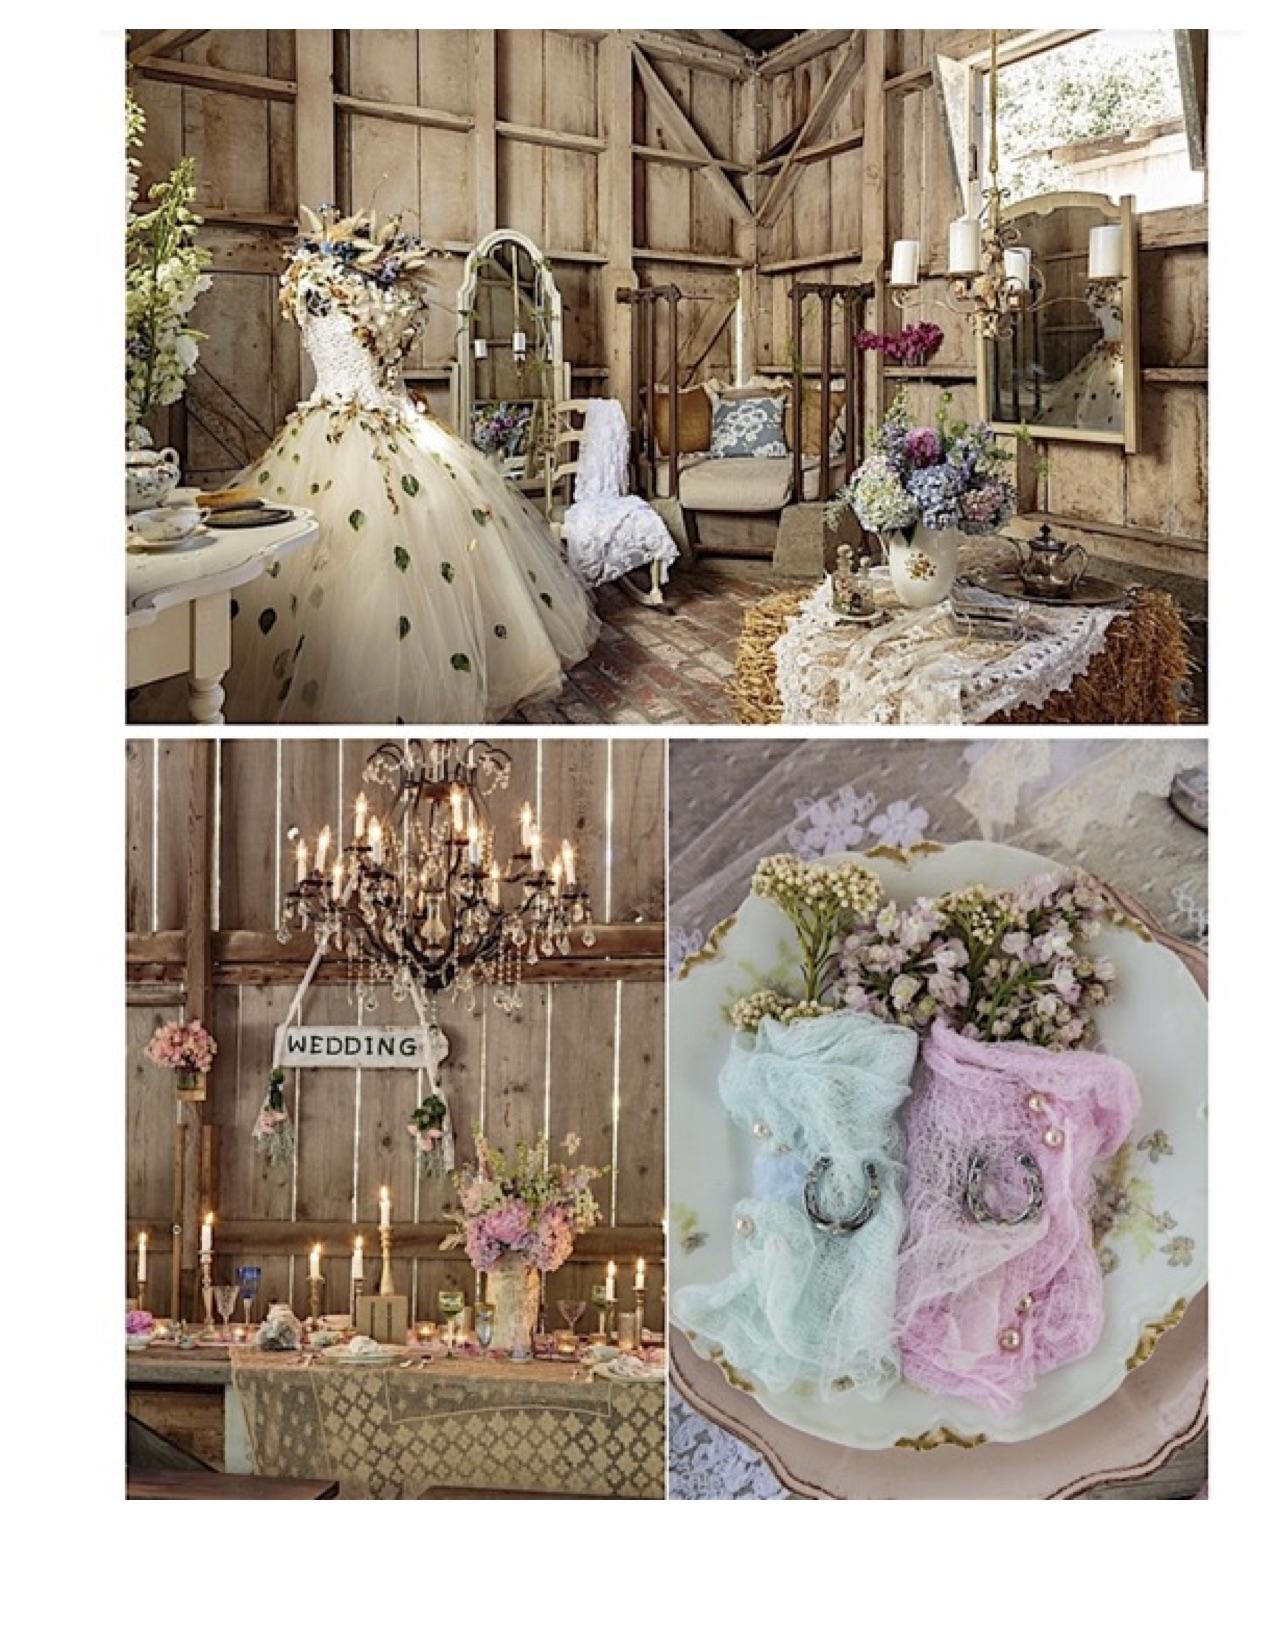 THE WEDDING OPERA-3.jpg